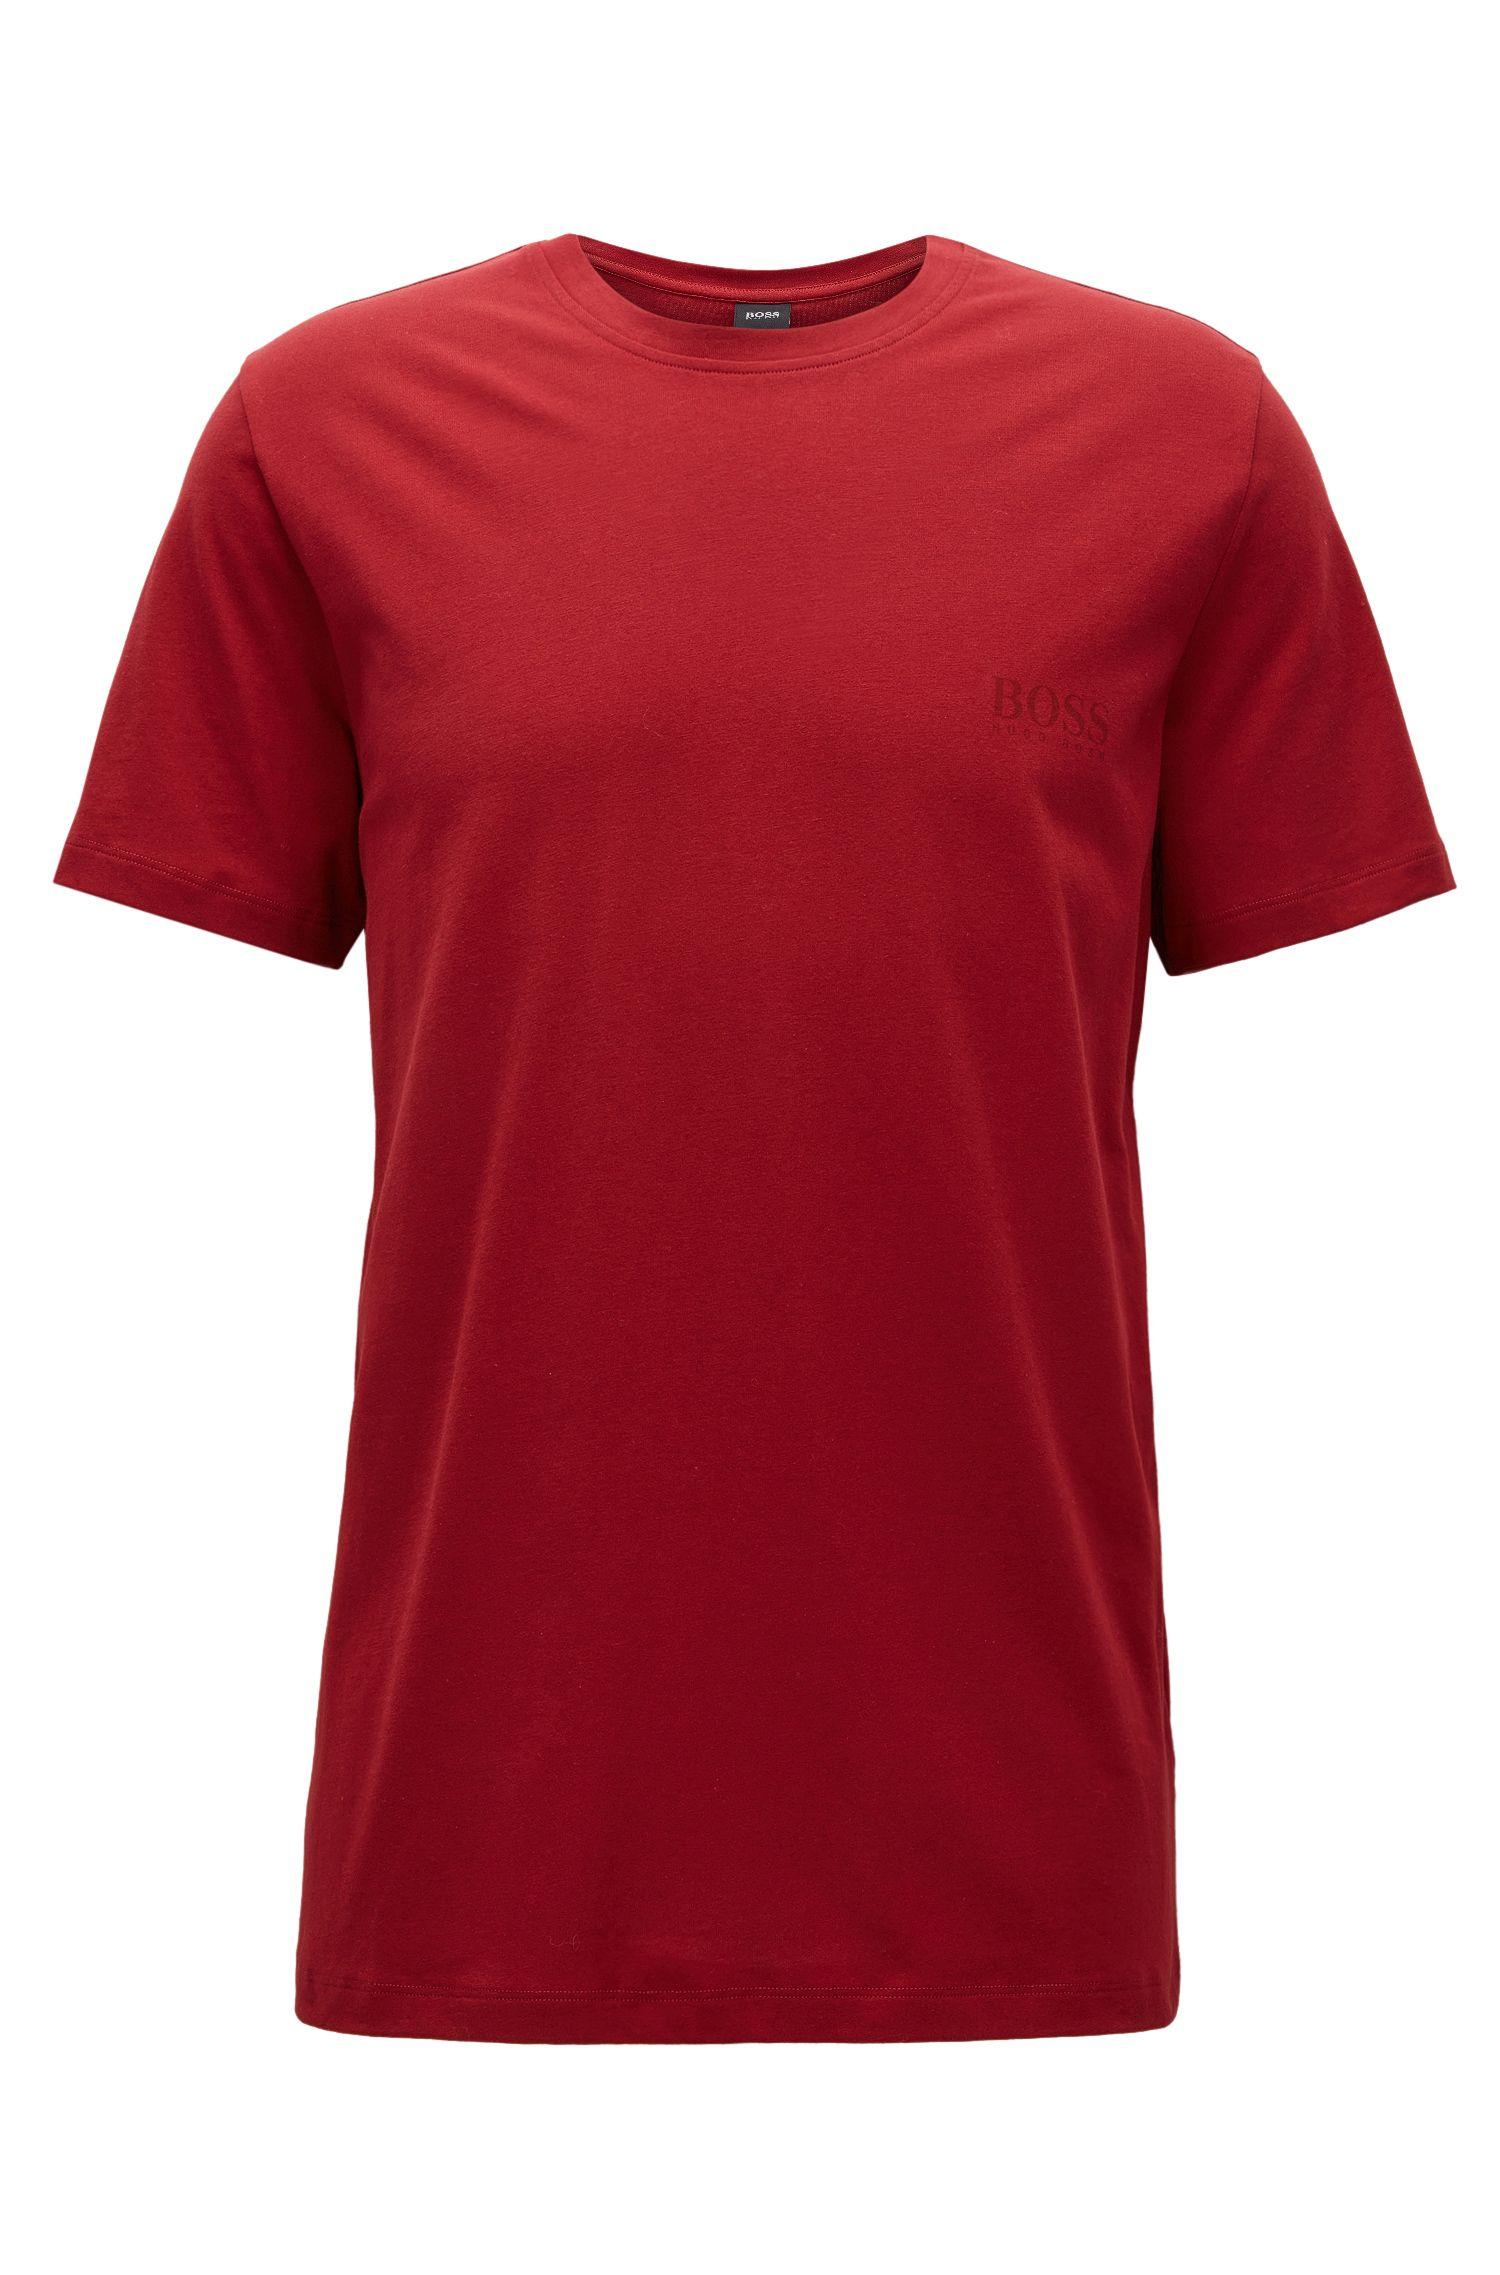 Camiseta relaxed fit en algodón suave